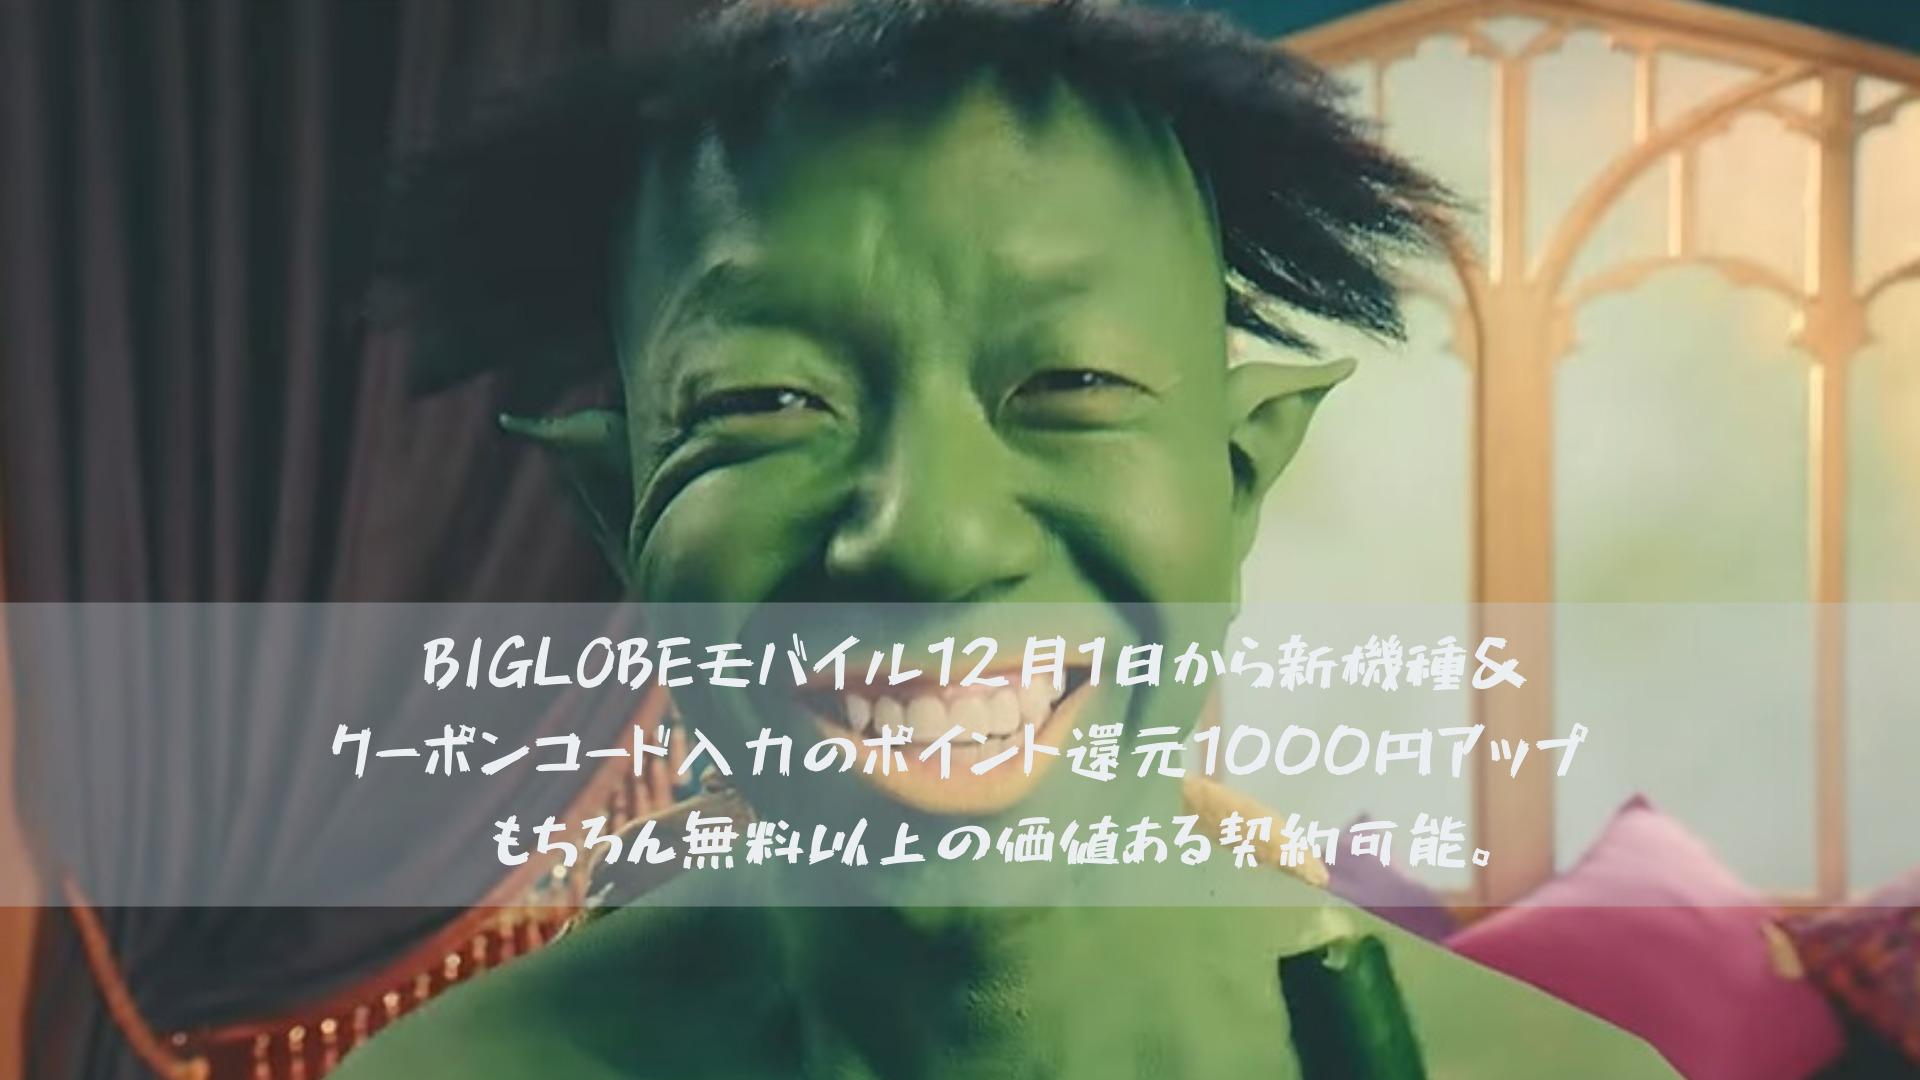 BIGLOBEモバイル12月1日から新機種&クーポンコード入力のポイント還元1000円アップ‼︎もちろん無料以上の価値ある契約できる。